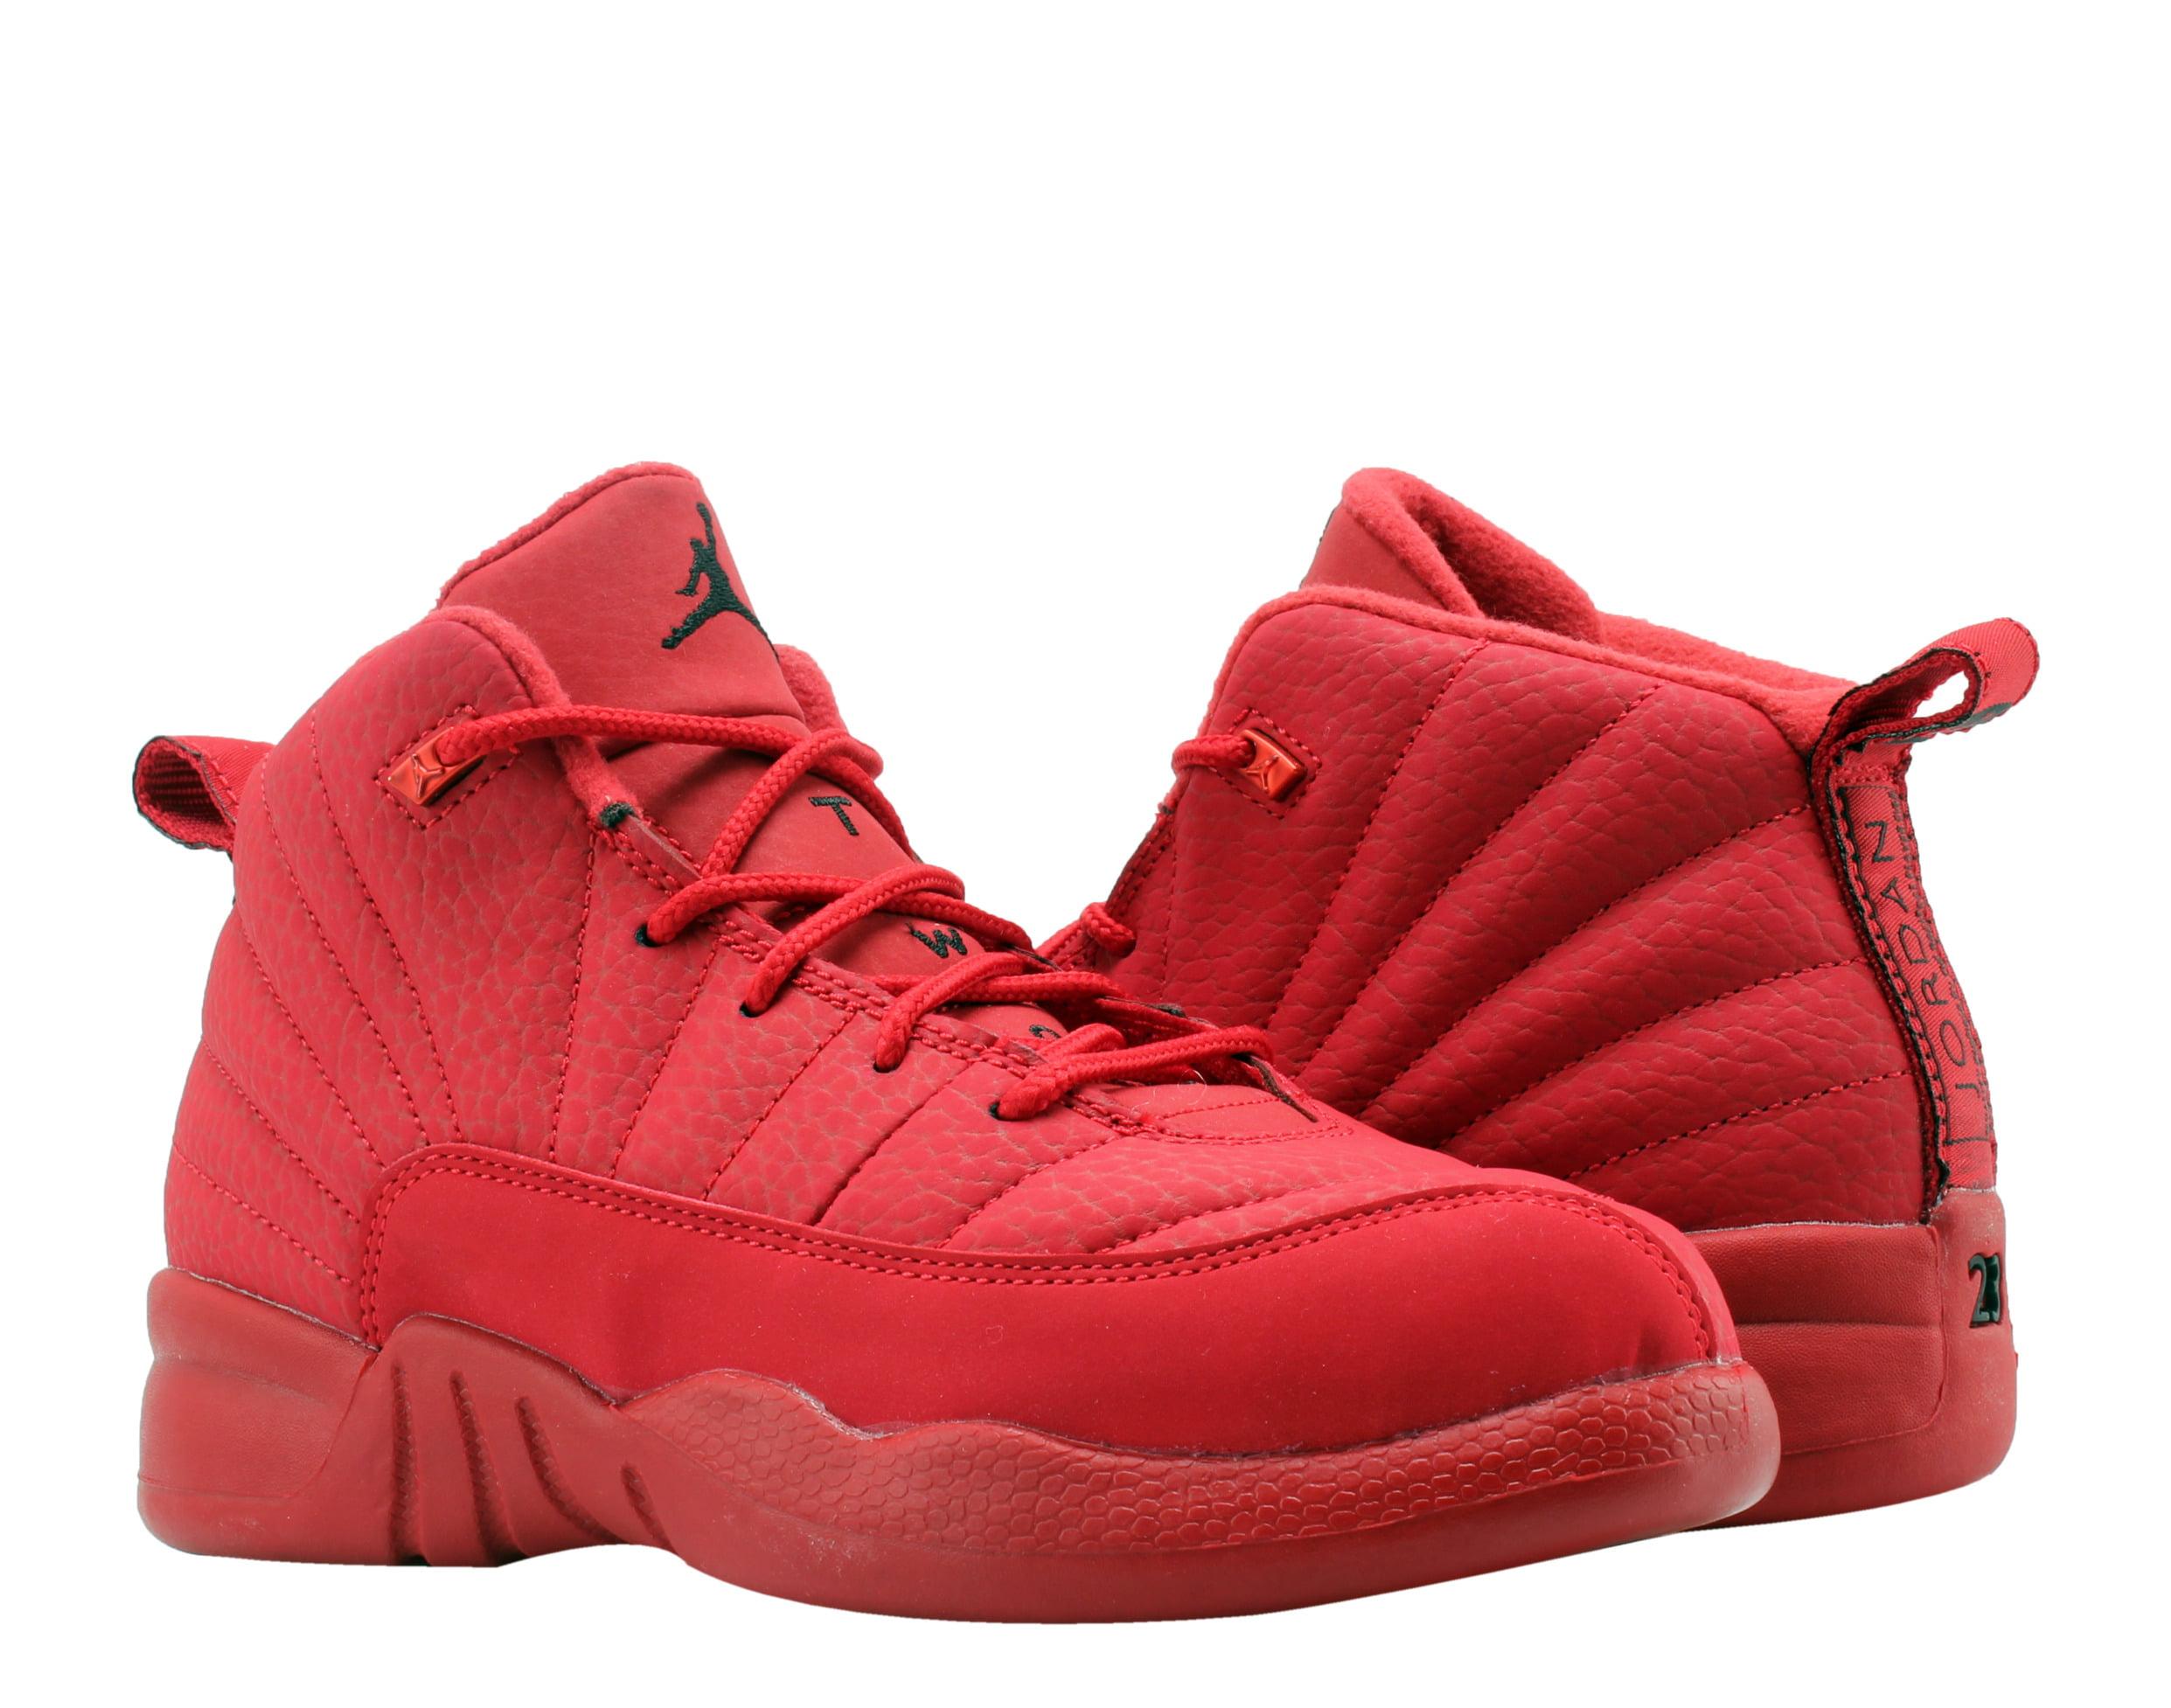 Nike Air Jordan 12 Retro Gym Red (PS) Little Kids Basketball Shoes 151186-601